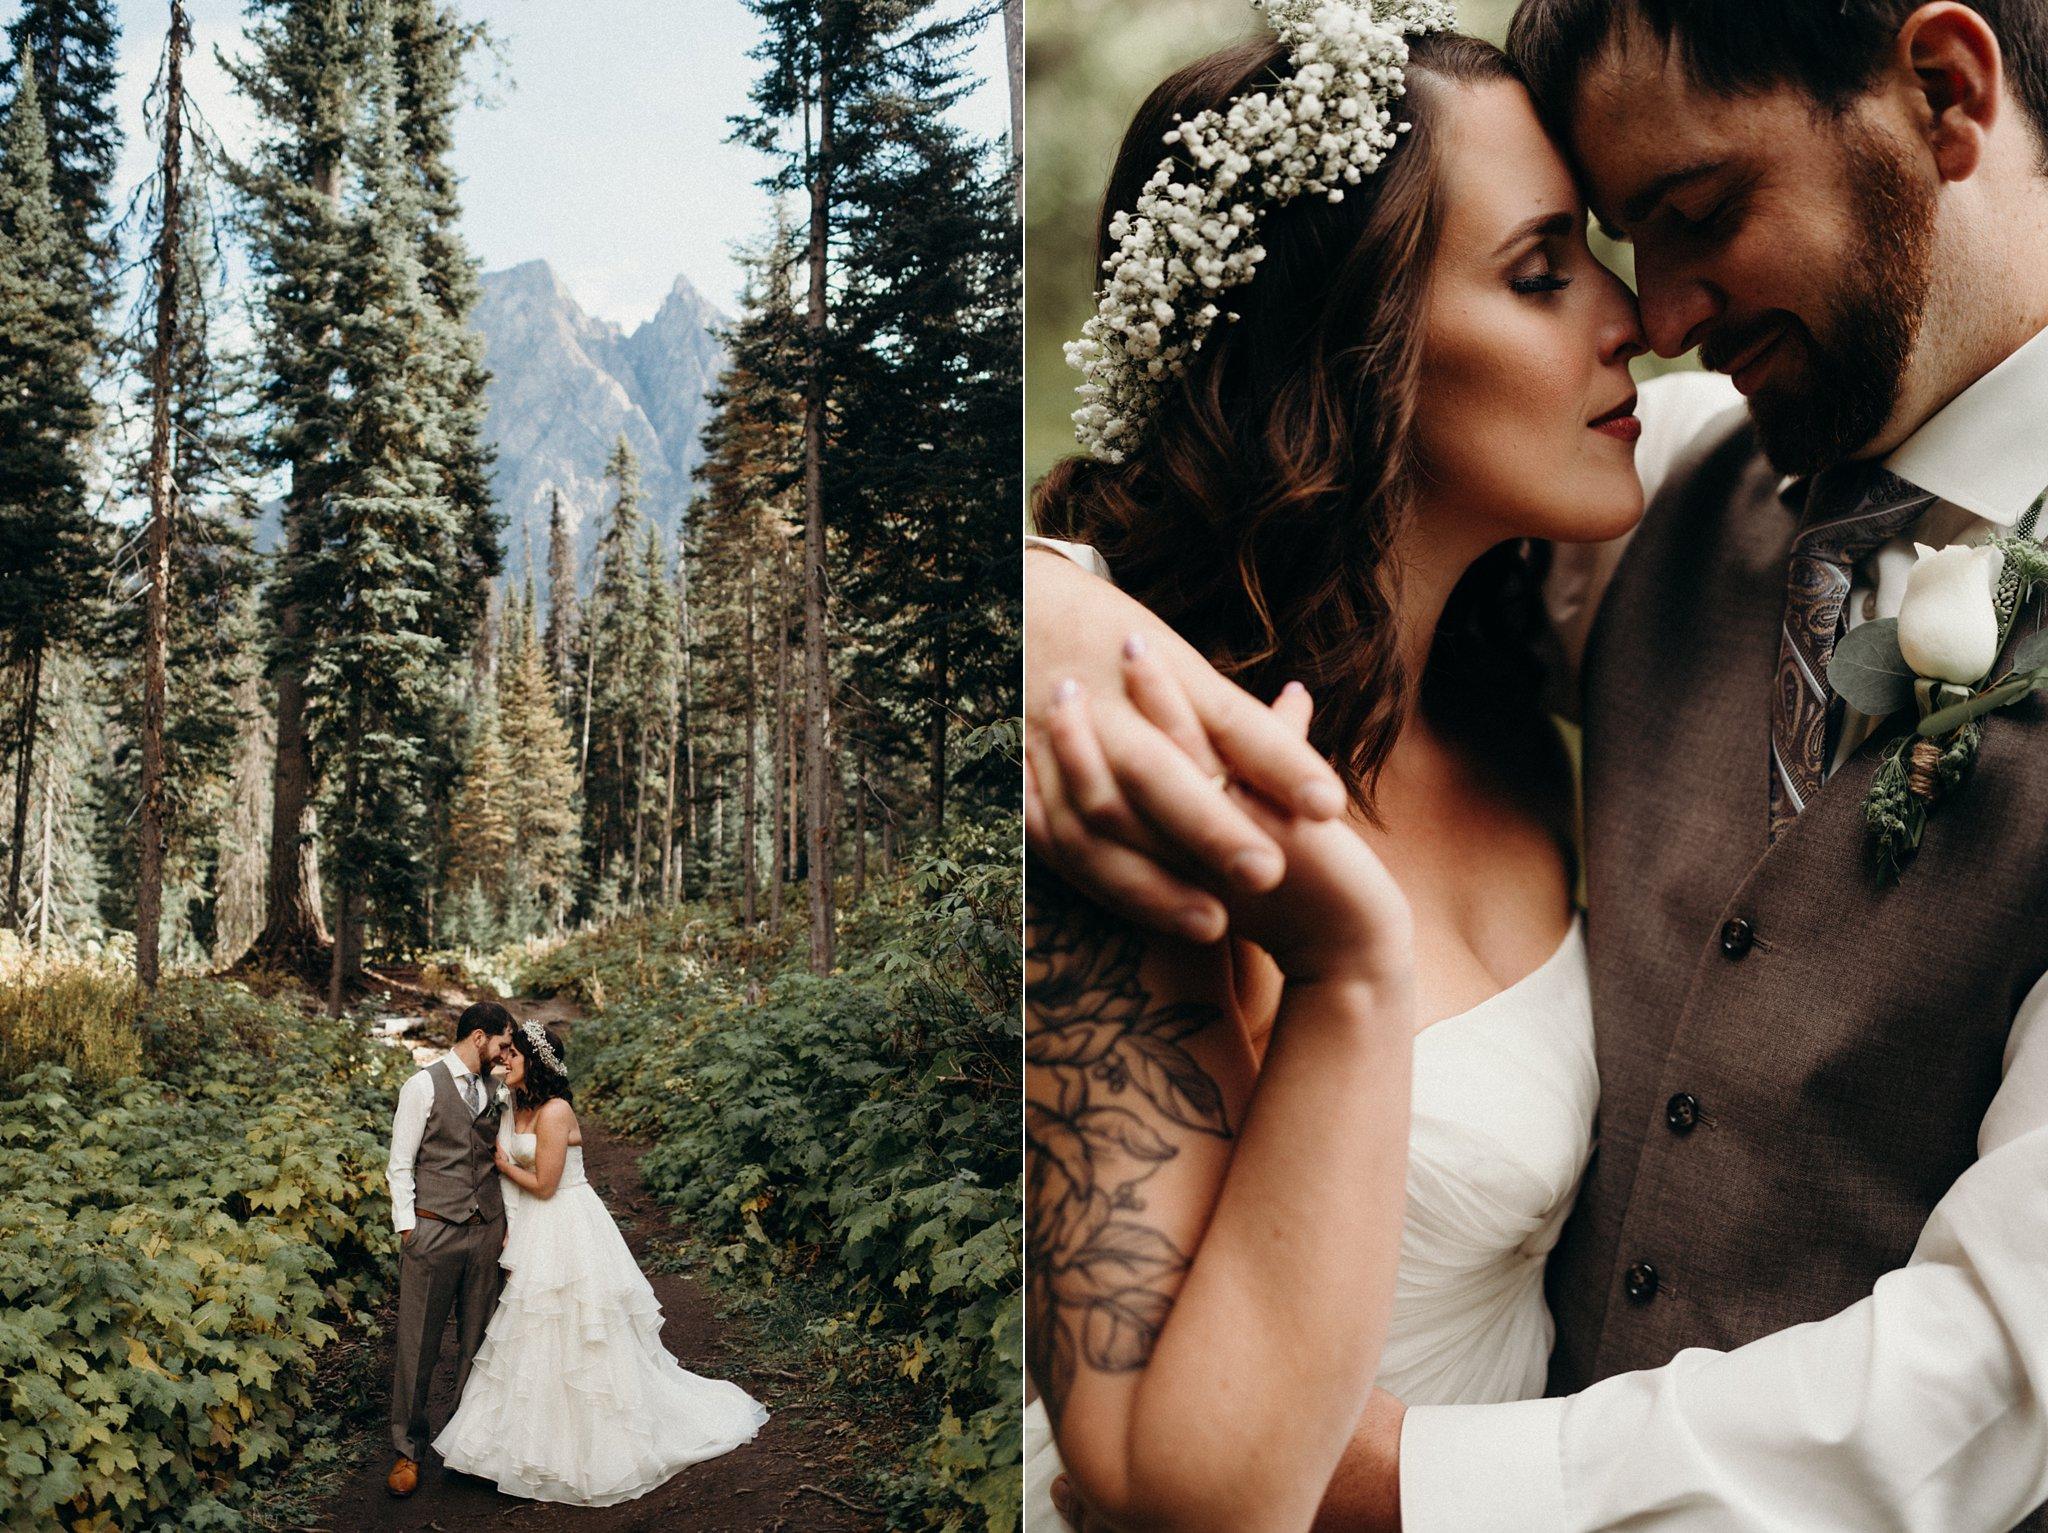 kaihla_tonai_intimate_wedding_elopement_photographer_6887.jpg